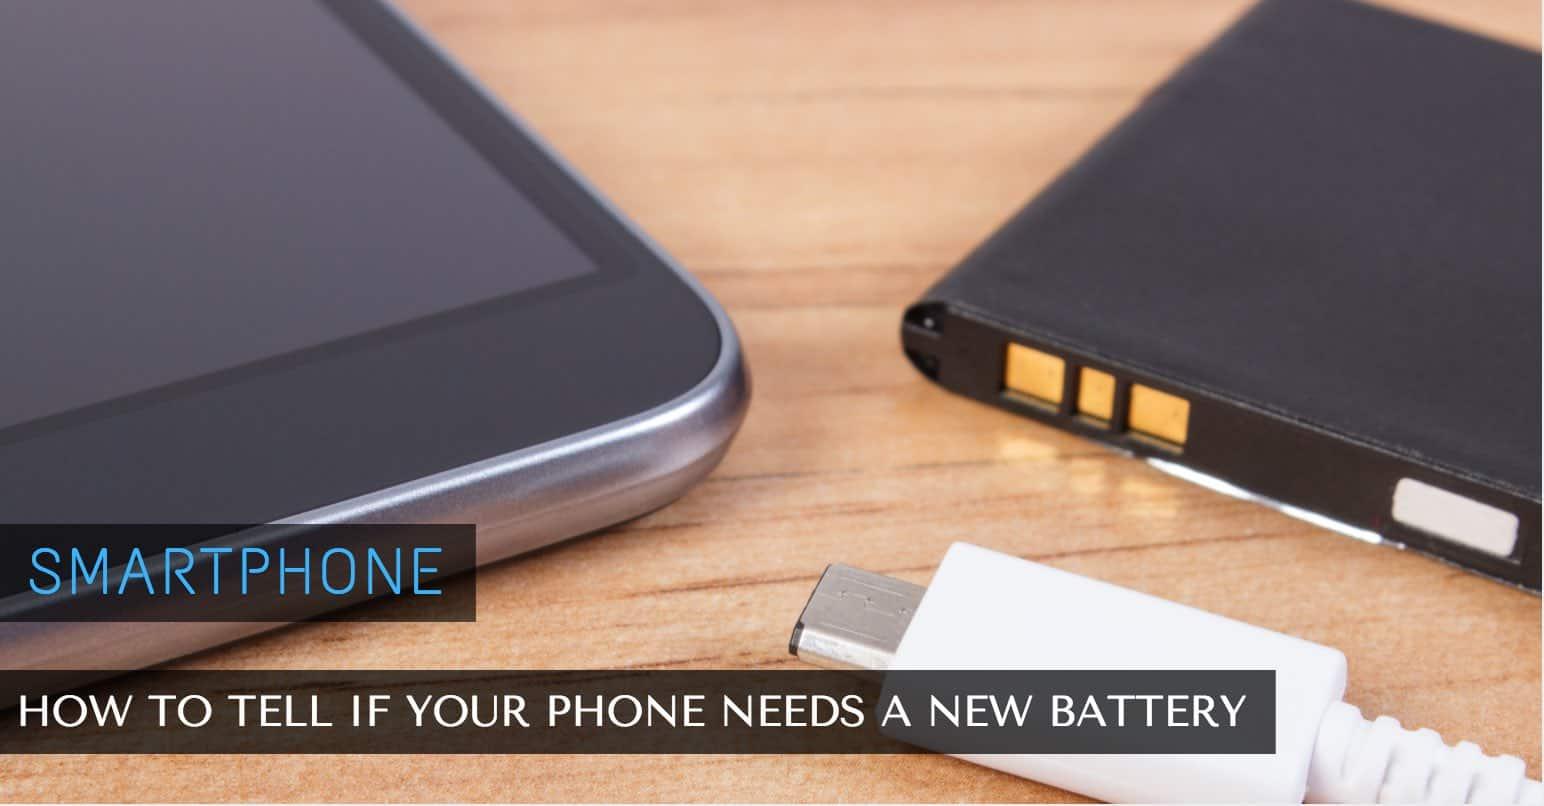 Needs a New Battery